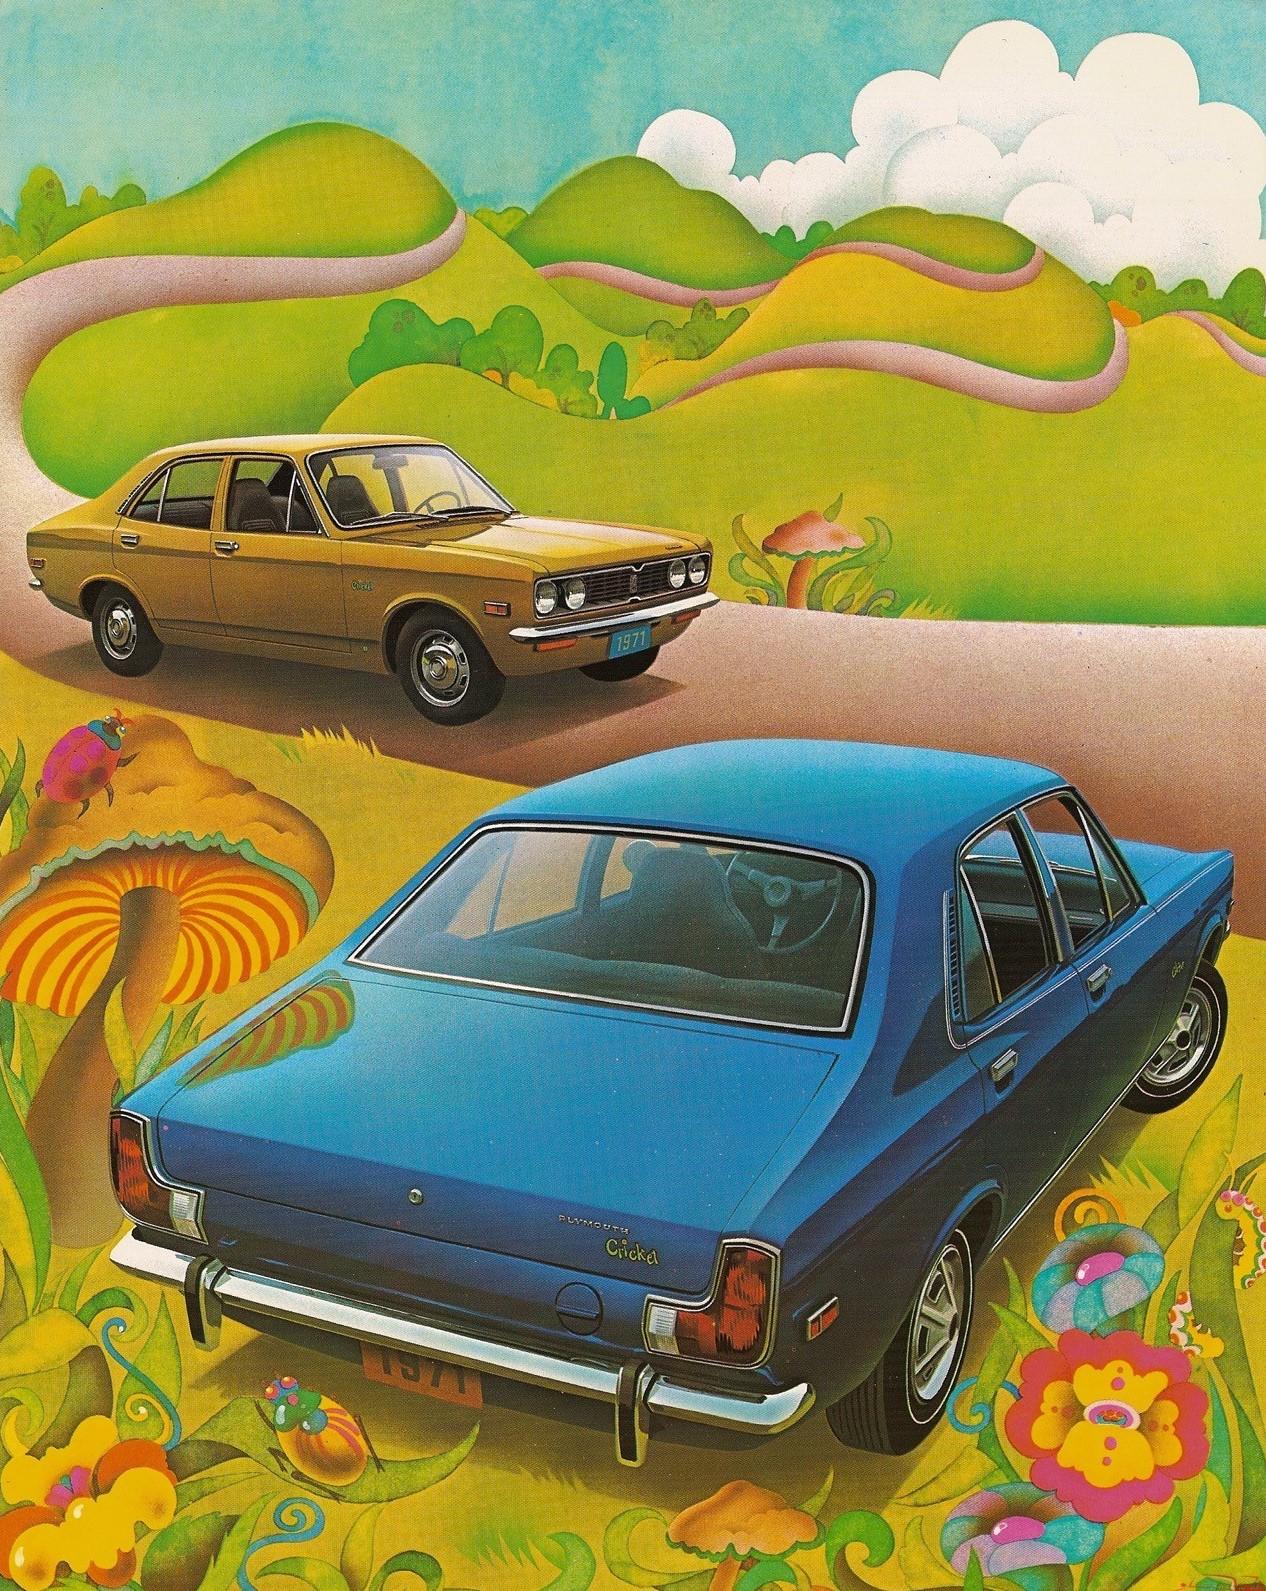 1971 Plymouth Cricket rear brochure